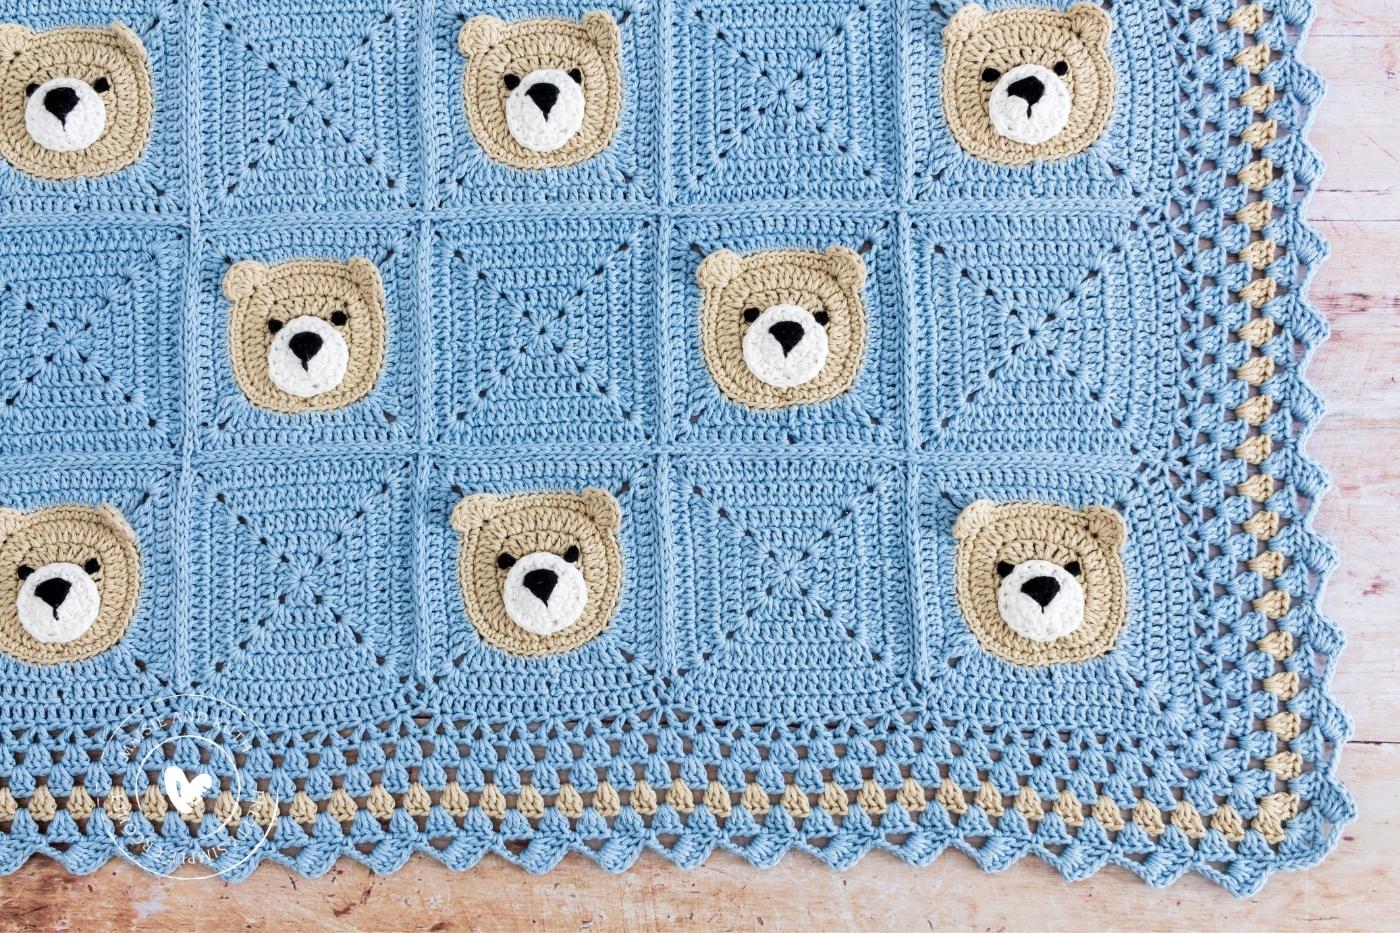 Bear Crochet Baby Blanket Flatlay on light wood table